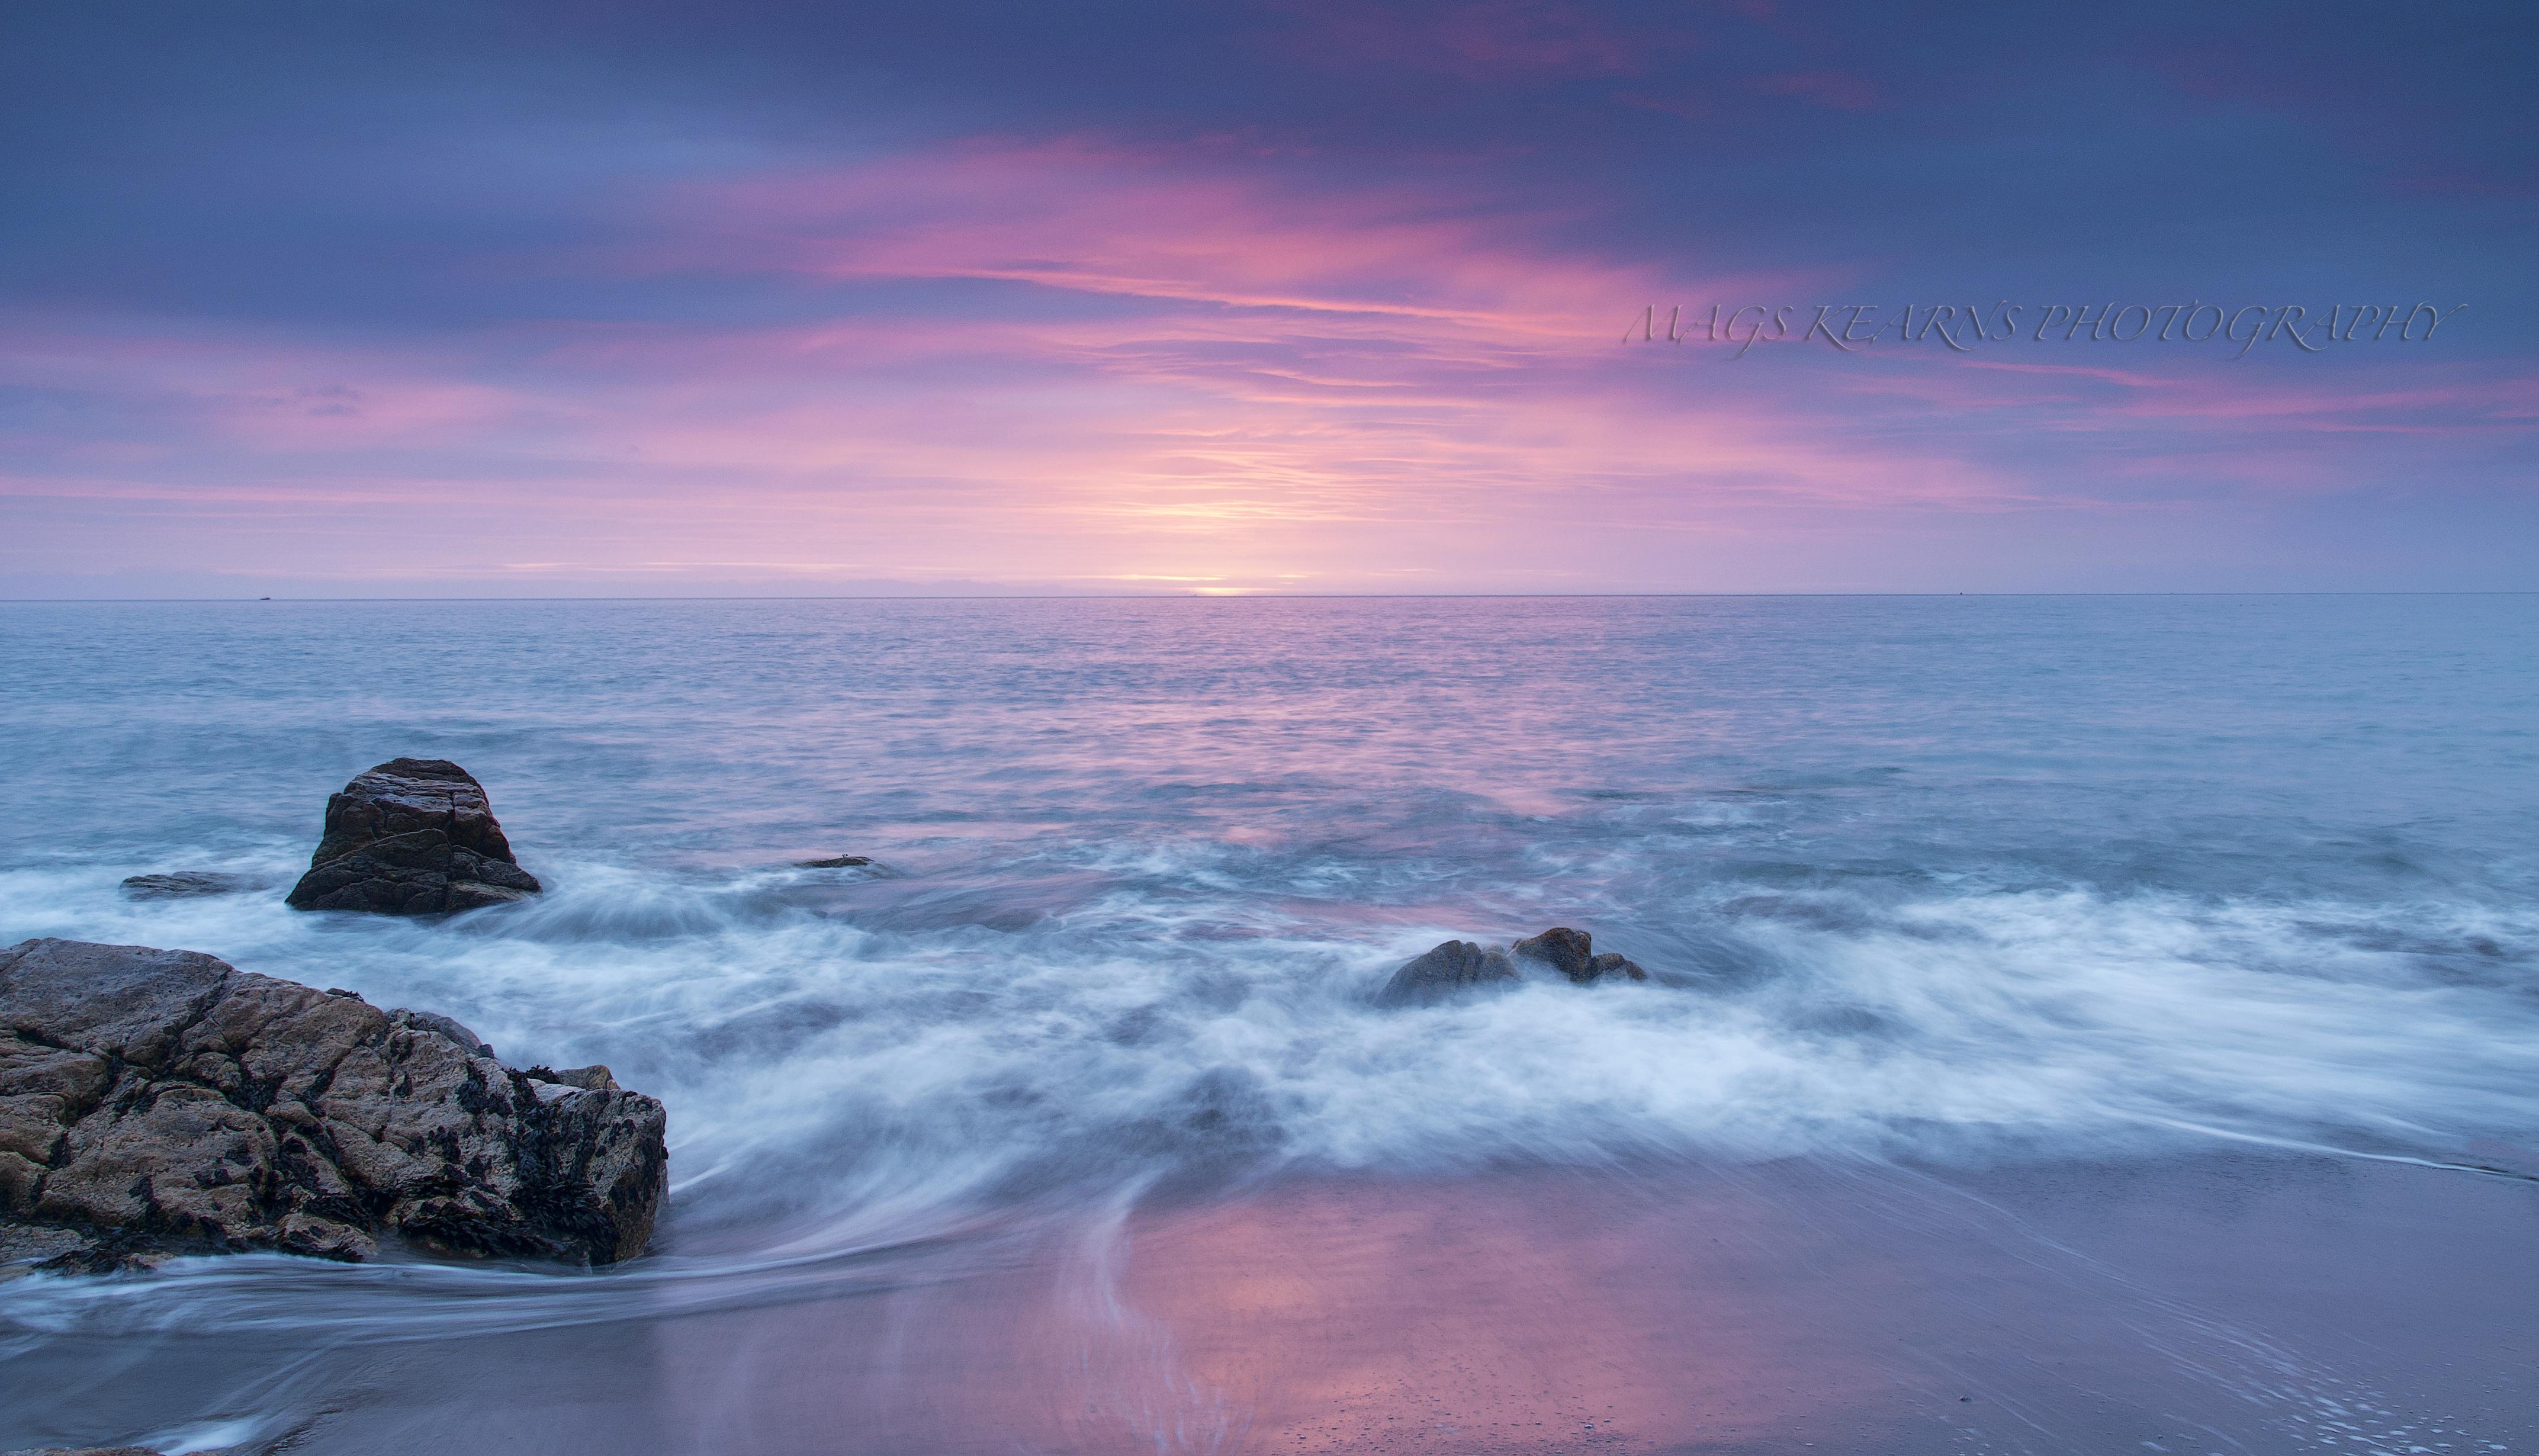 Hintergrundbilder Landschaft Sonnenuntergang Meer